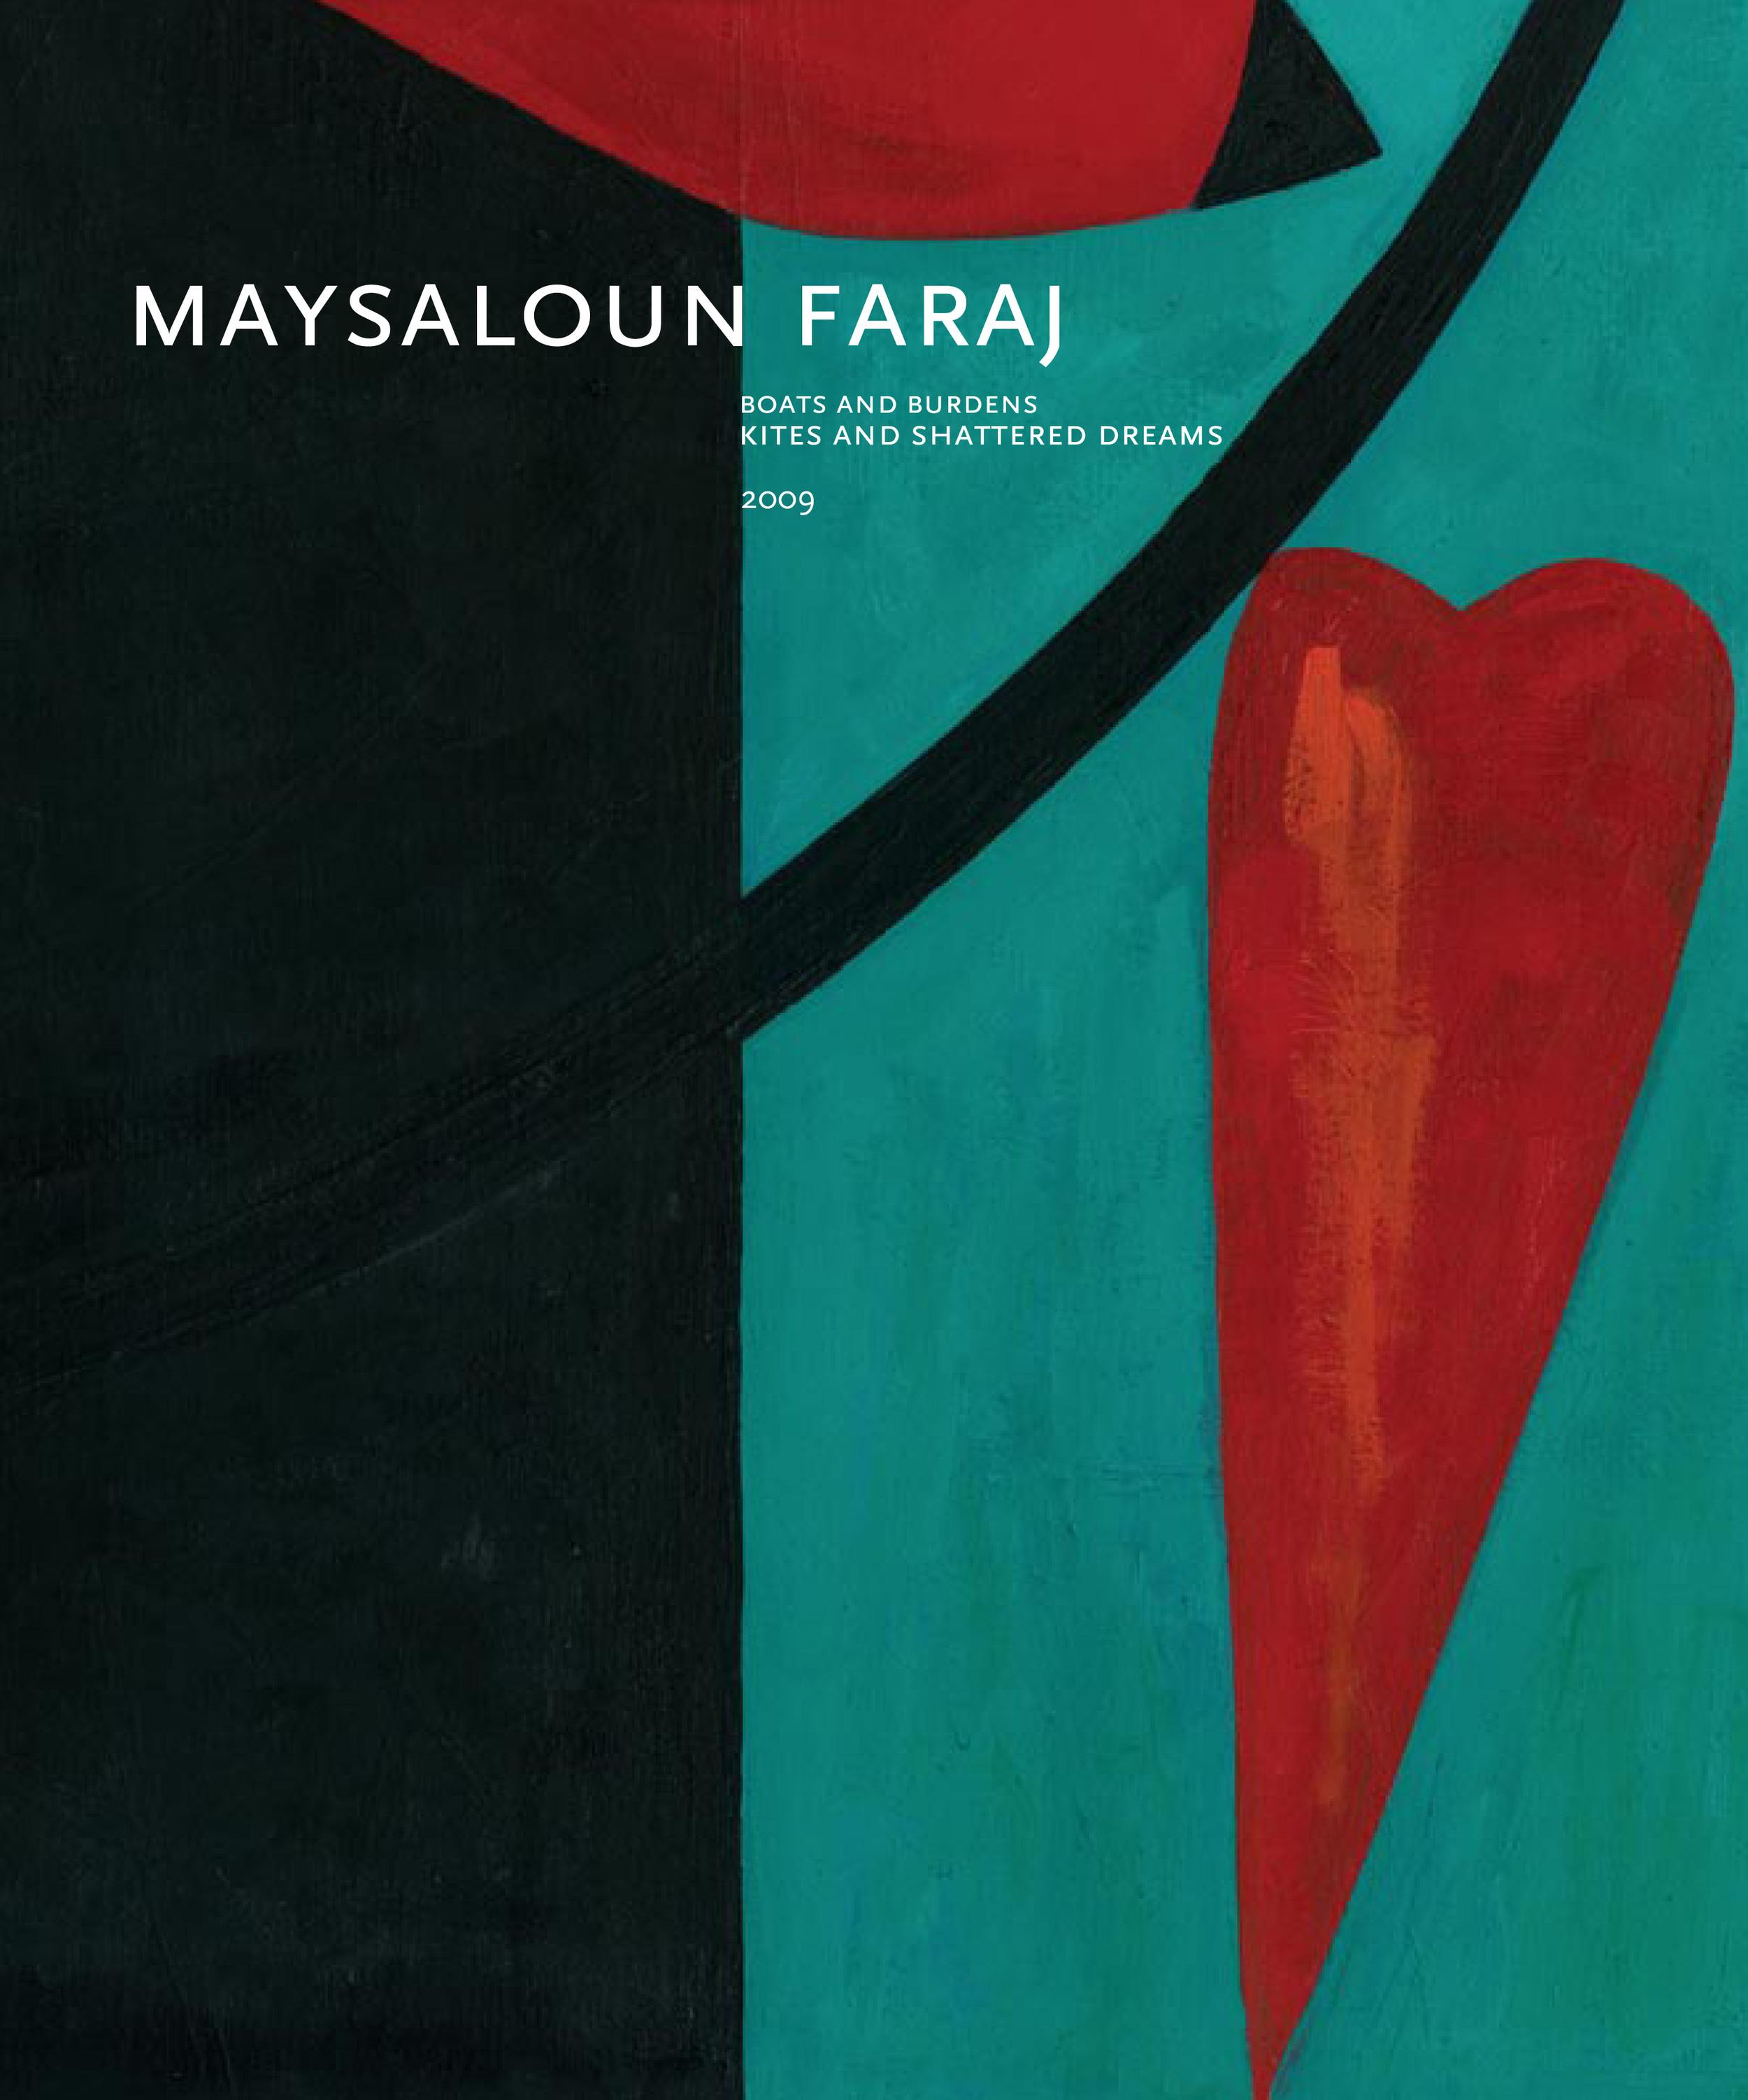 View  Maysaloun Faraj Kites and Shattered Dreams on ISSUU